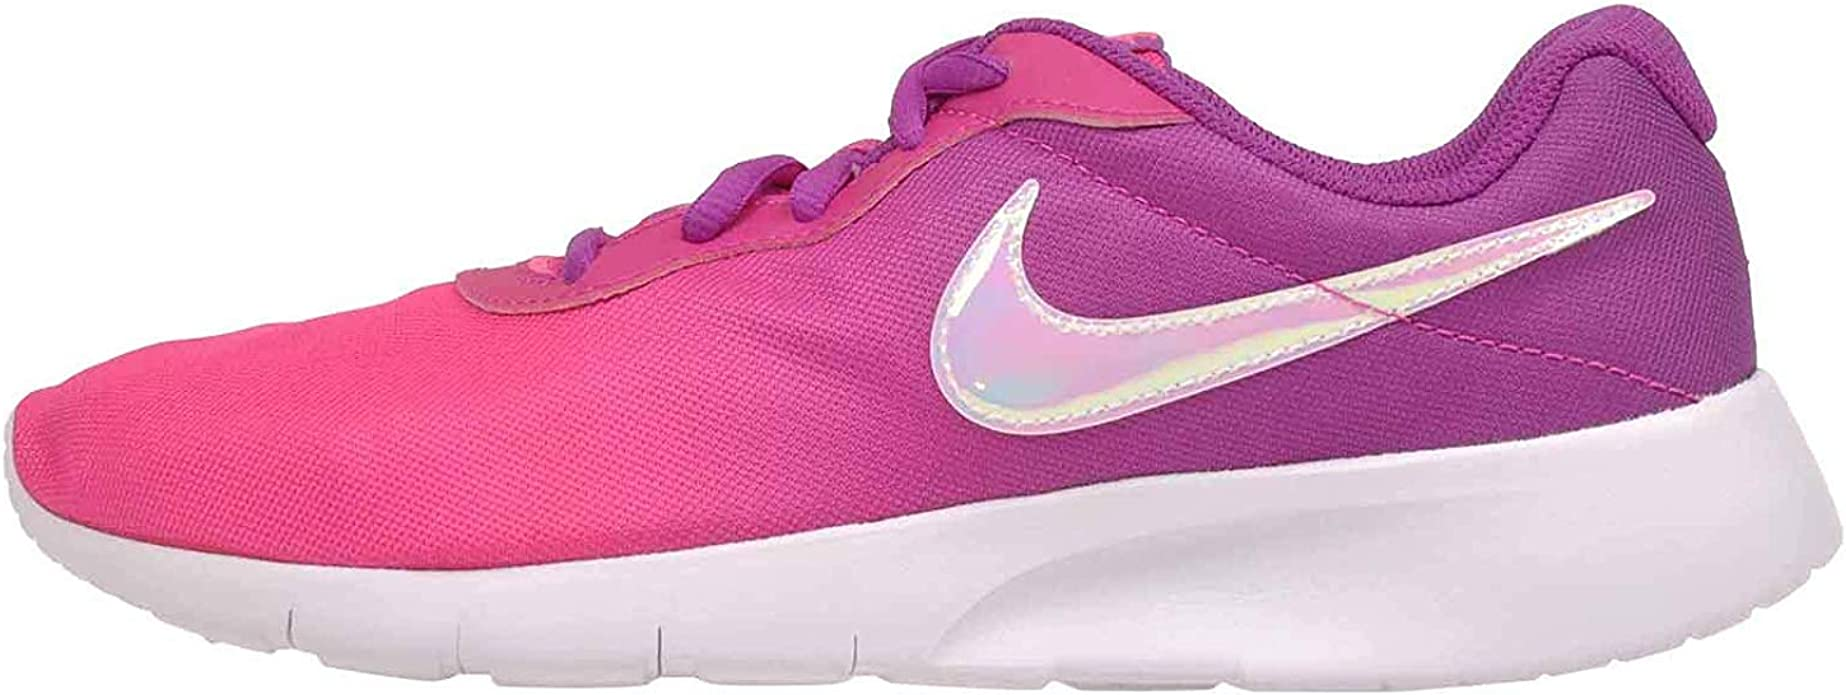 admirar radio Contaminado  Amazon.com | Nike Girl's, Tanjun Print GS Sneaker - Big Kid Pink Purple |  Sneakers